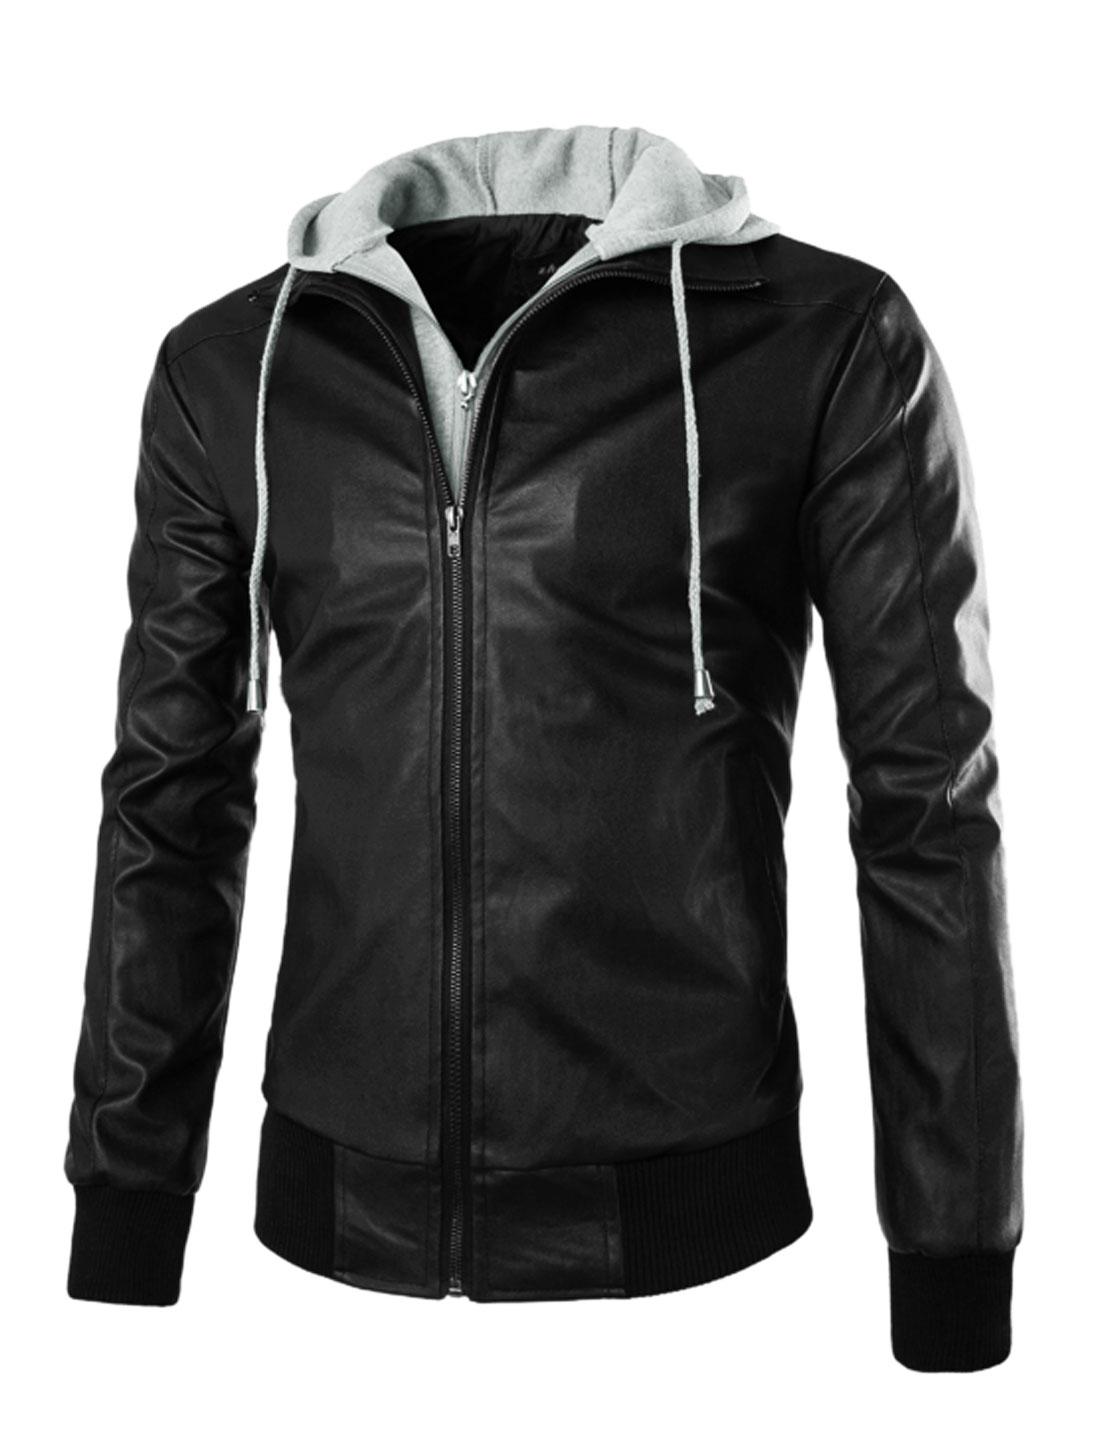 Men Turn Down Collar Ribbed Hem PU Leather Hooded Jacket Black M